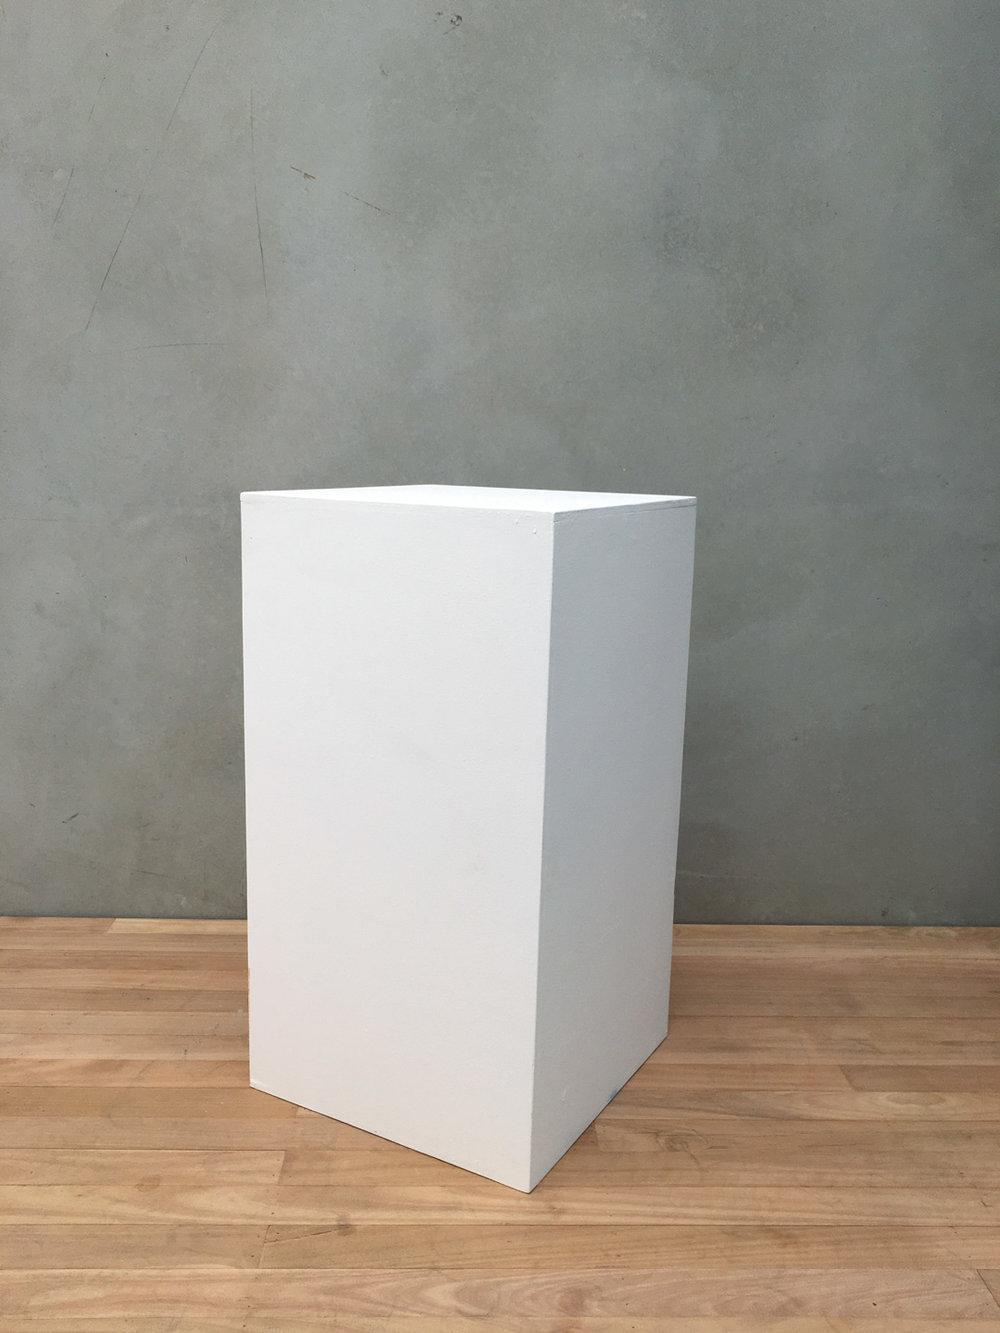 500 X 500 X 925 STANDARD WHITE